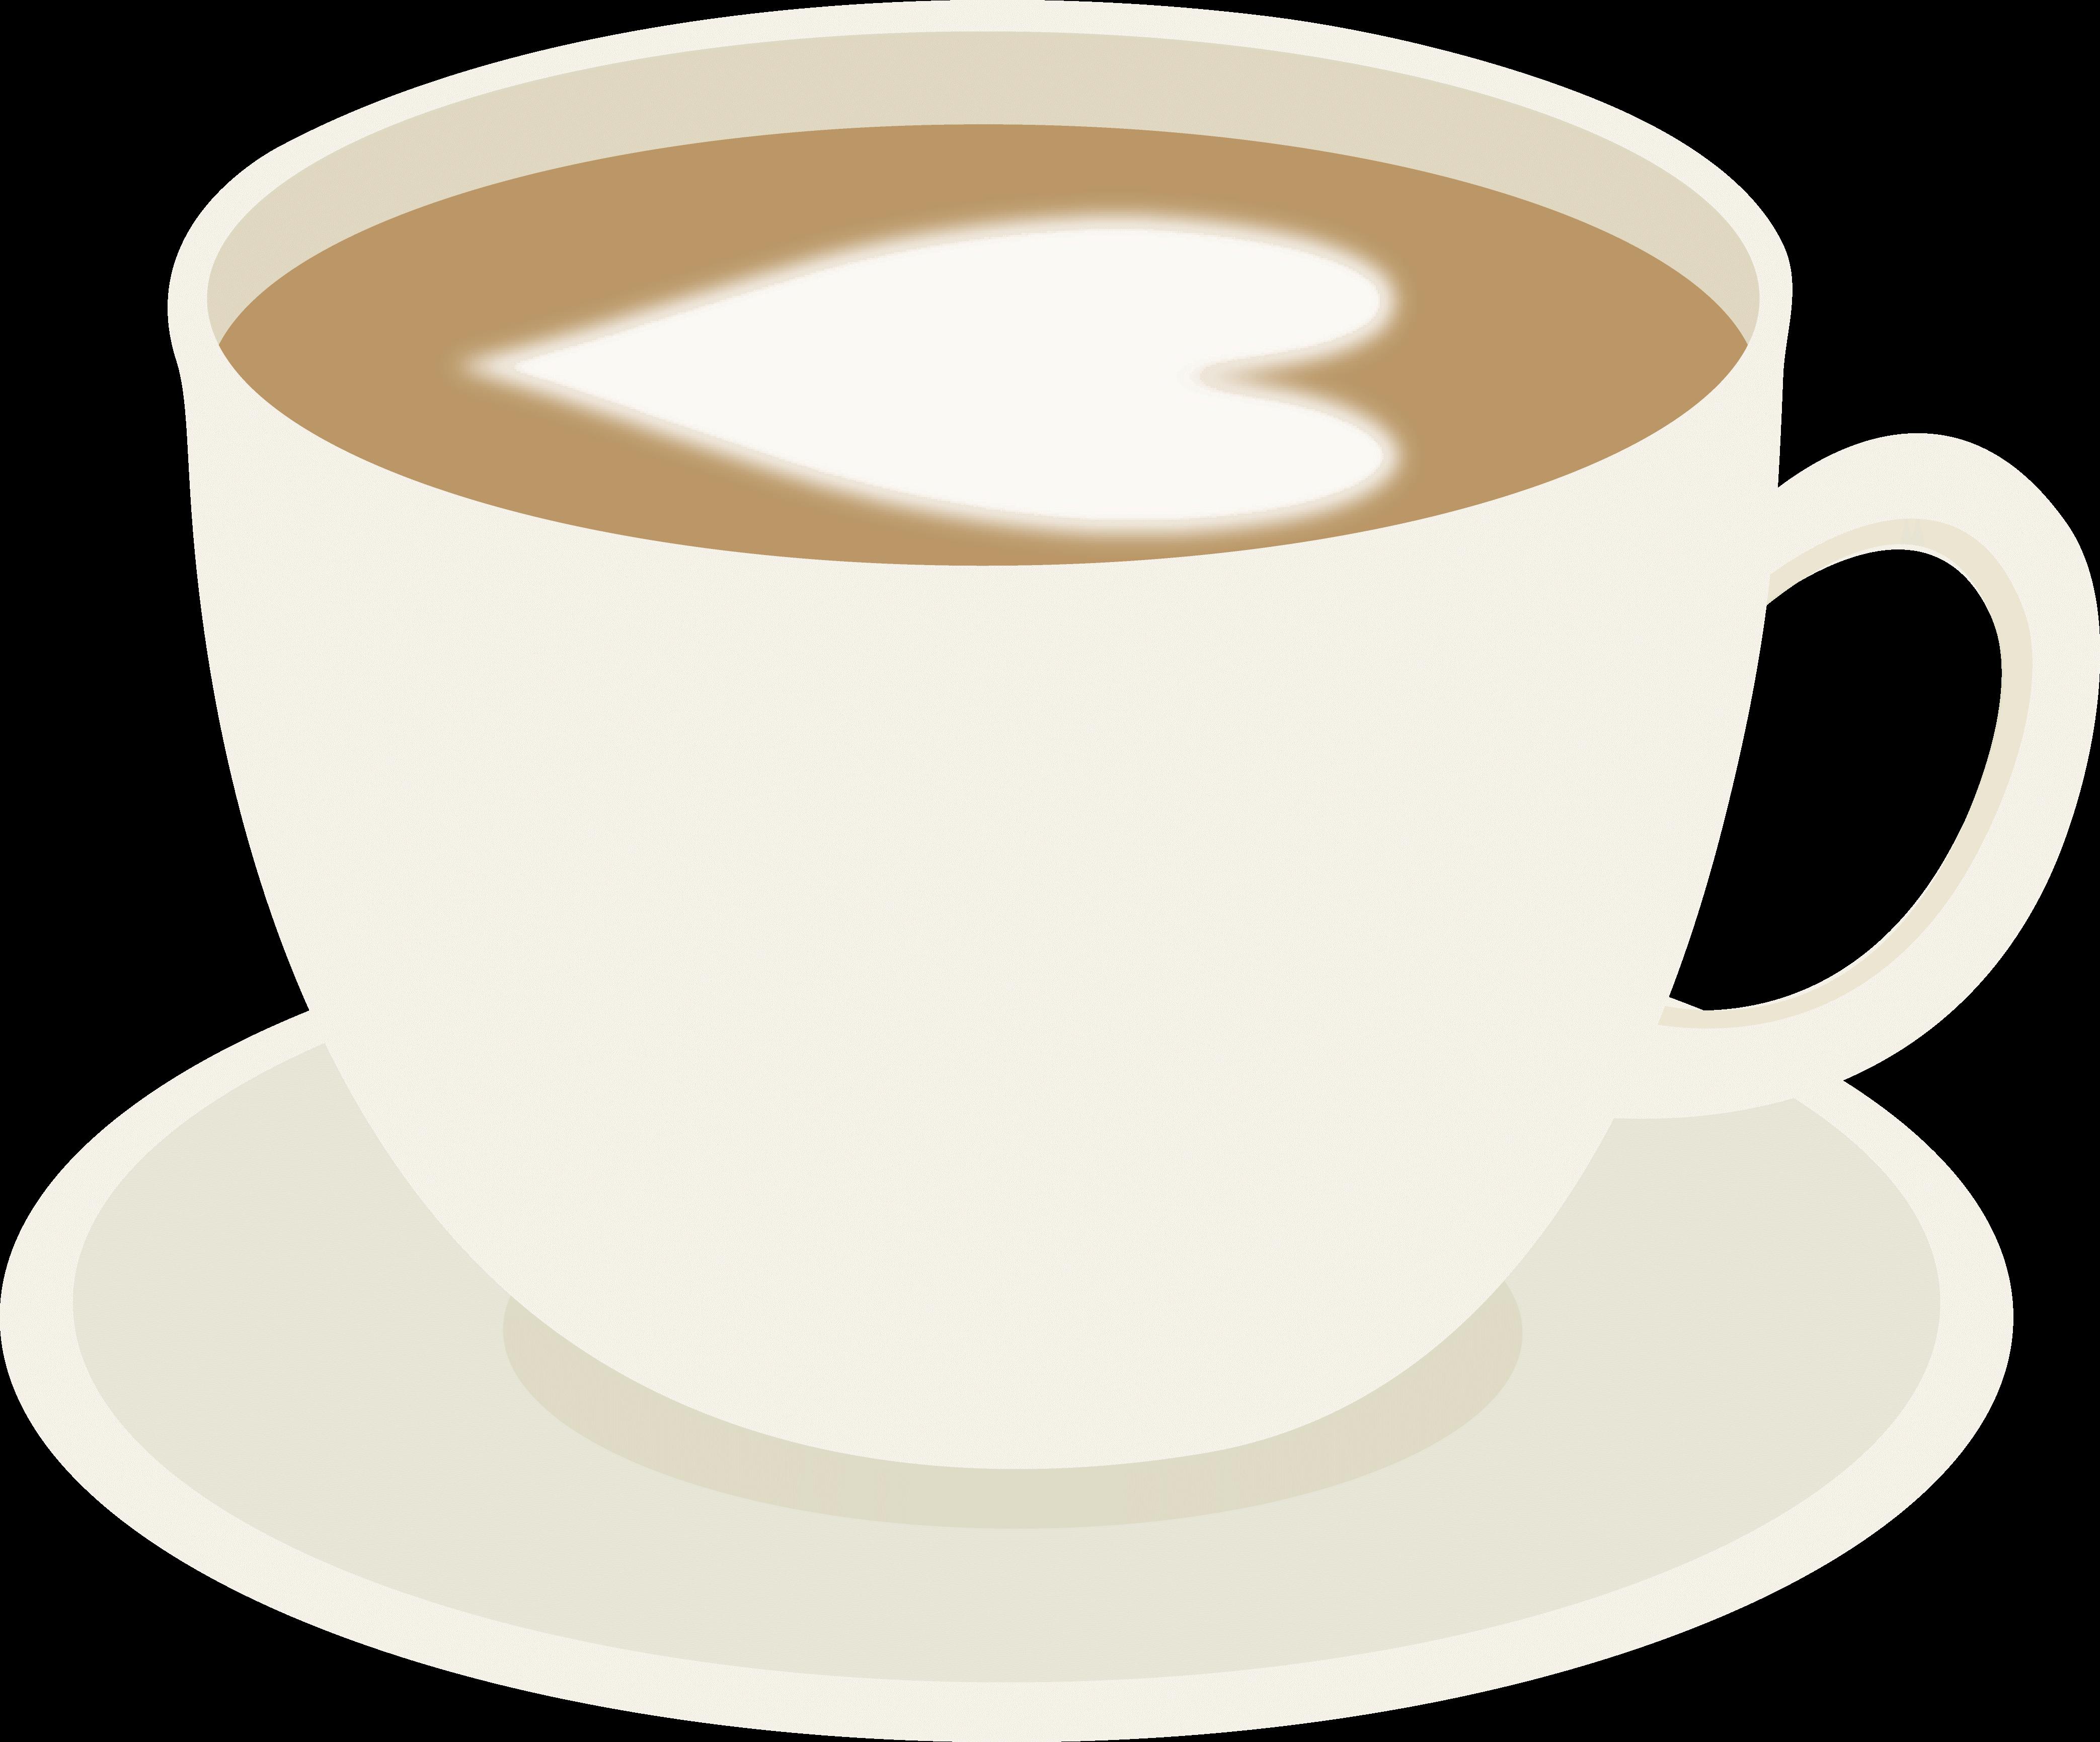 Free Coffee Creamer Cliparts, Download Free Clip Art, Free.